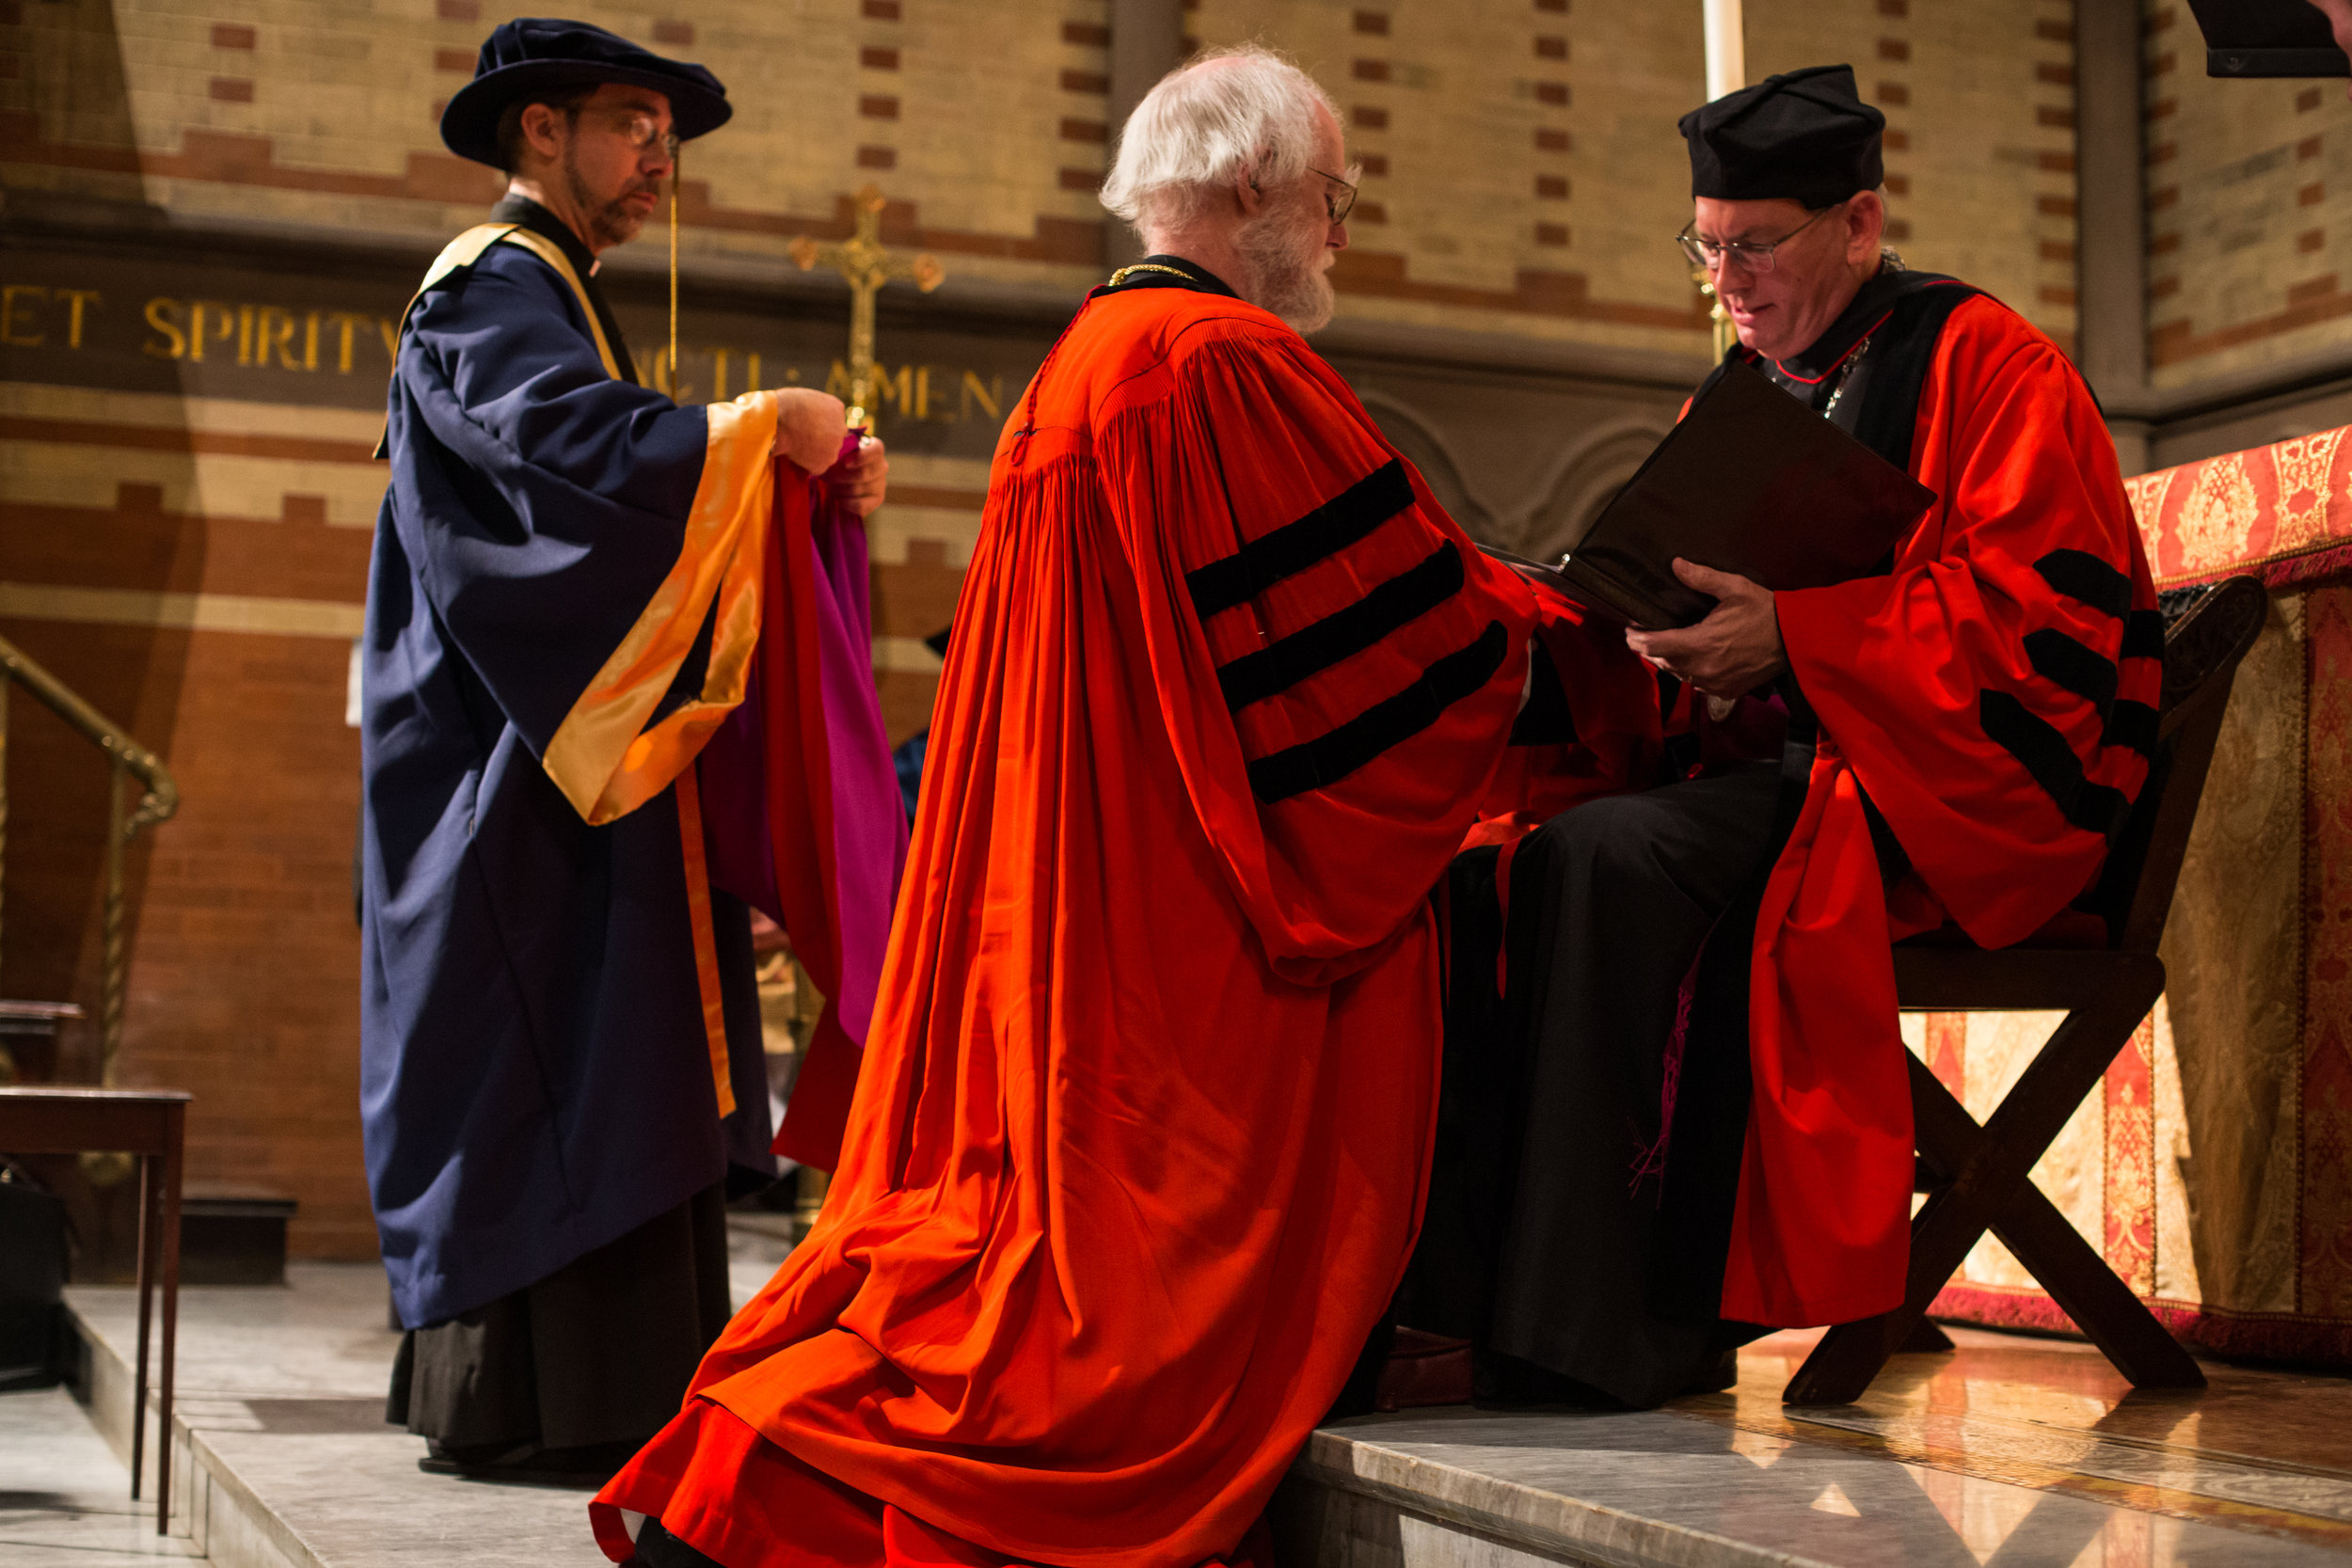 Conferral of honorary degree on Rowan Williams